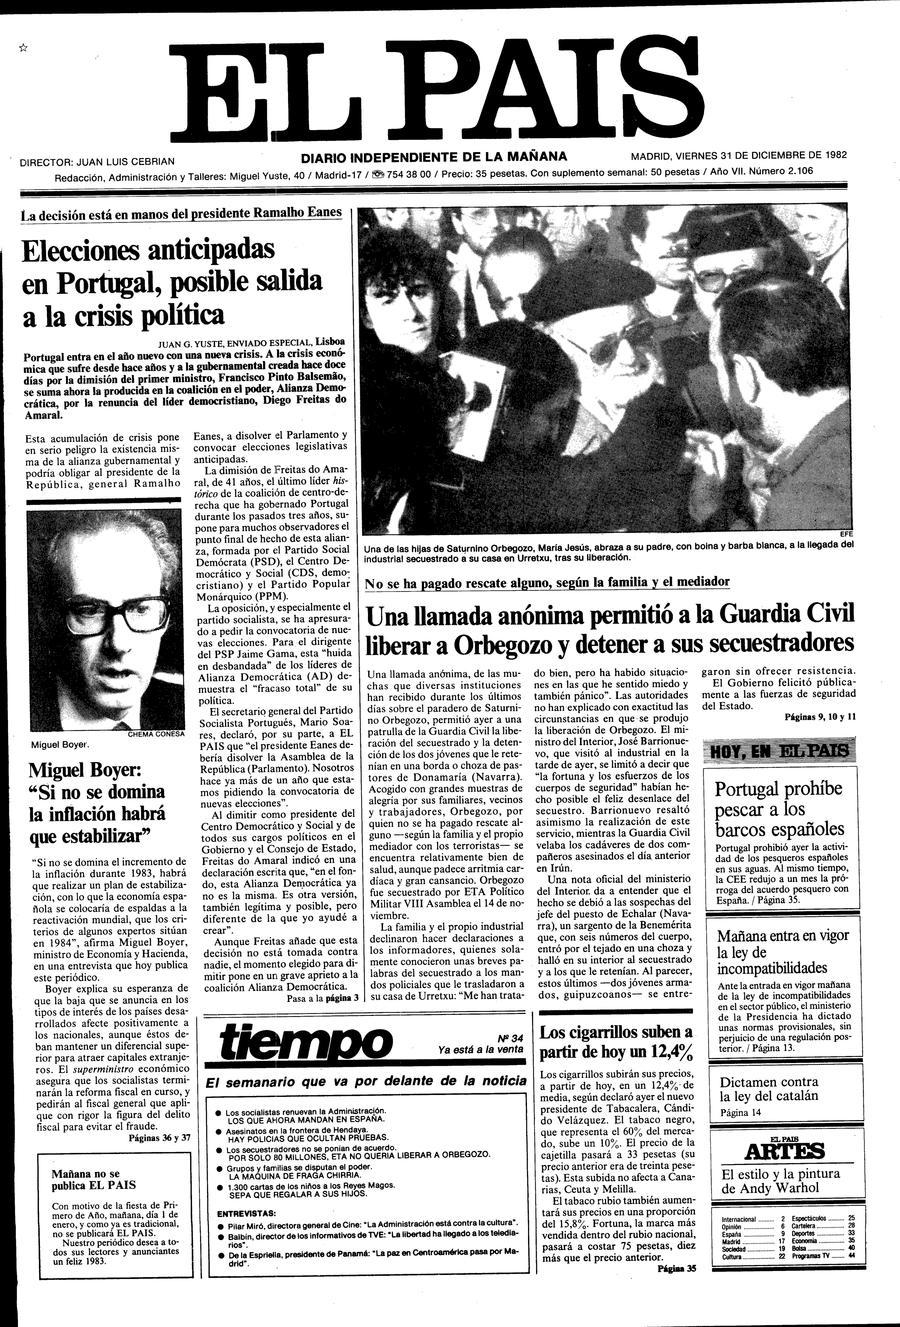 31 de Diciembre de 1982